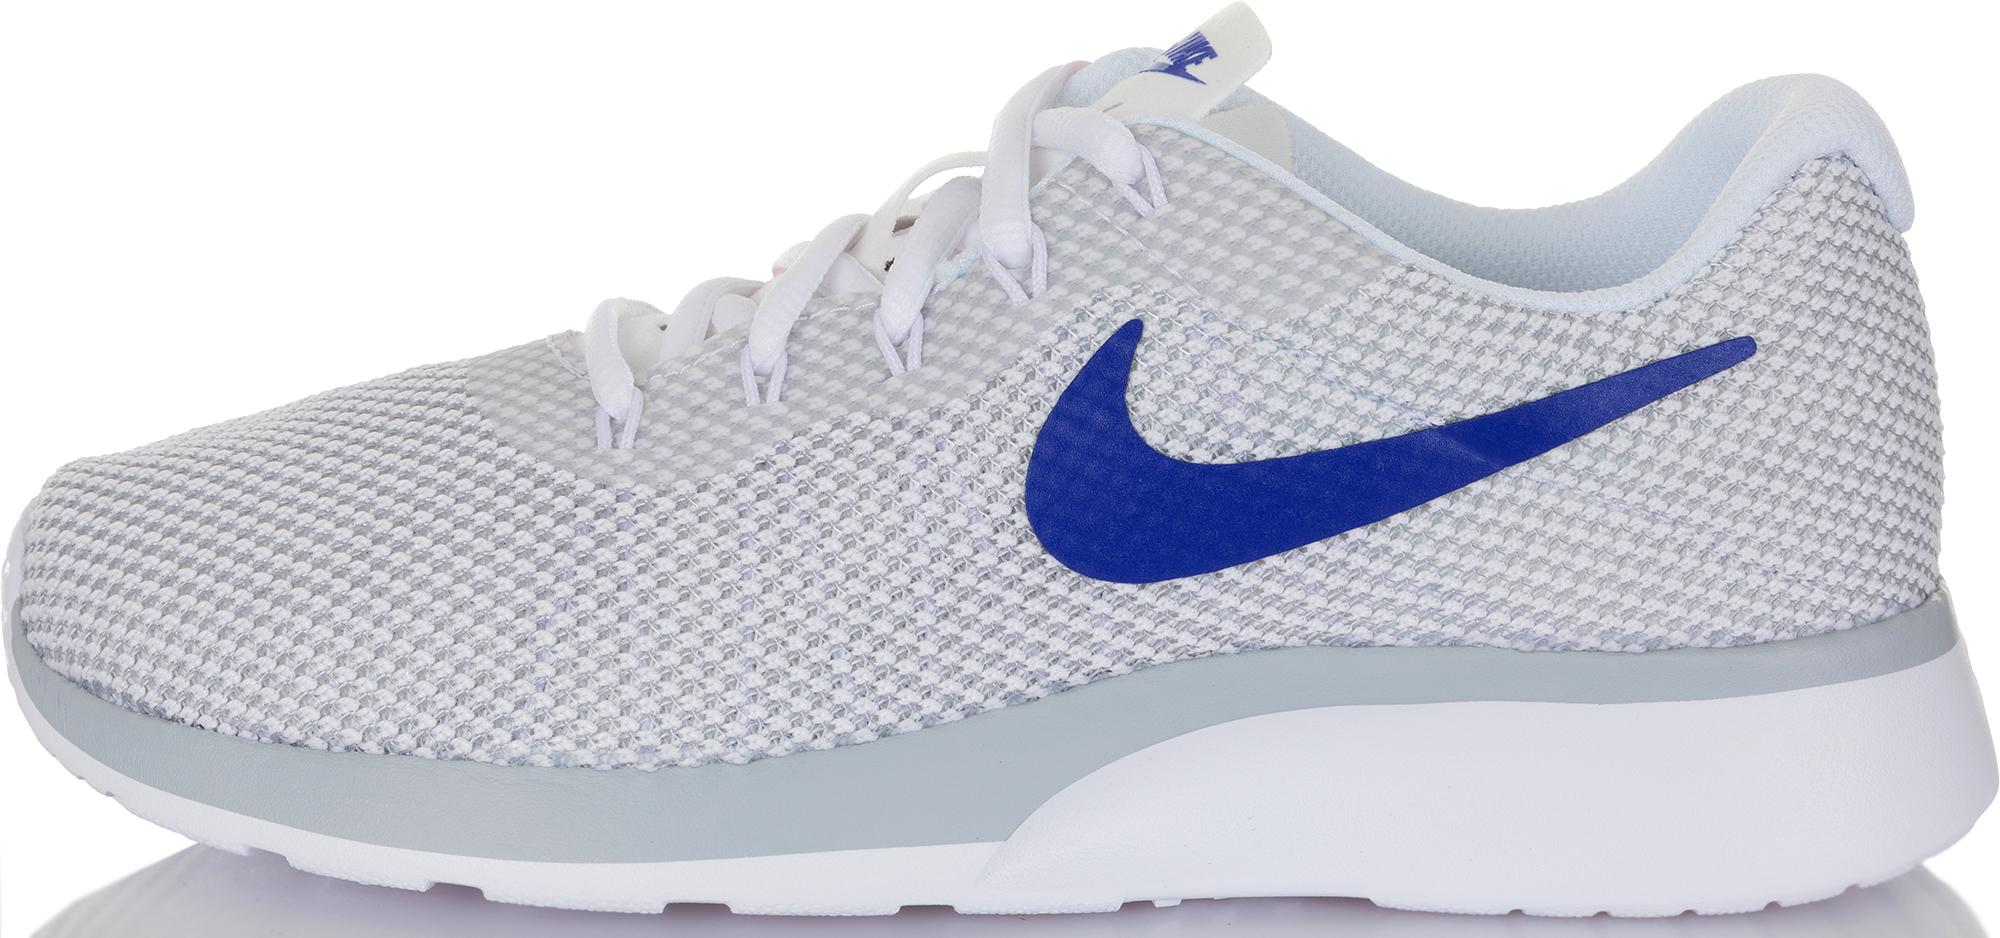 Nike Кроссовки женские Nike Tanjun Racer, размер 39 цена